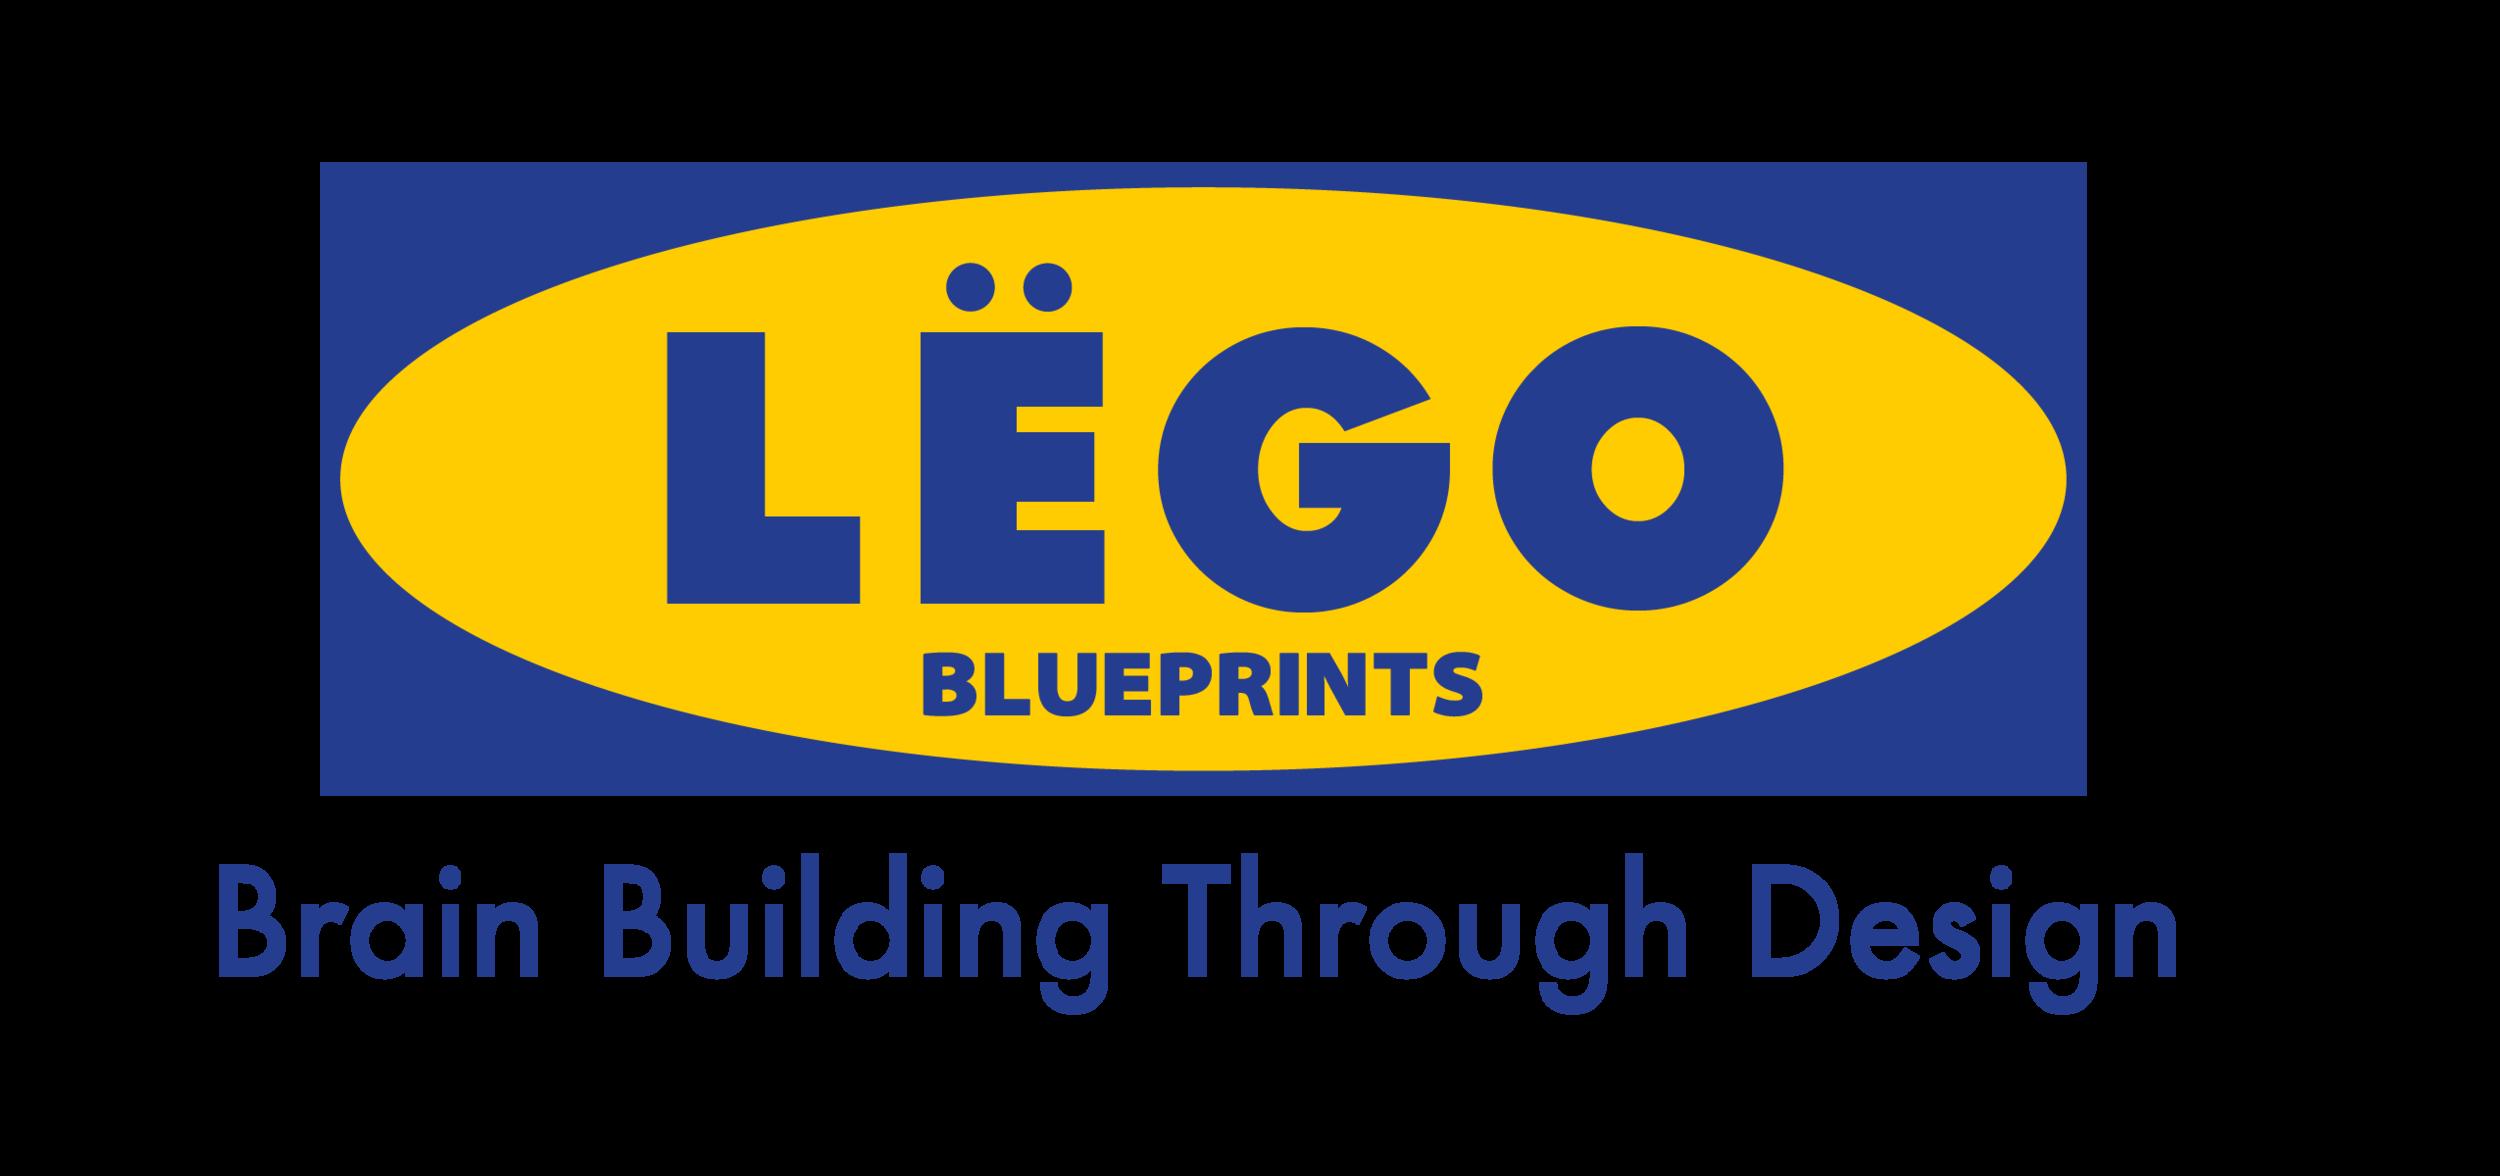 lego blueprints LOGO-03.png